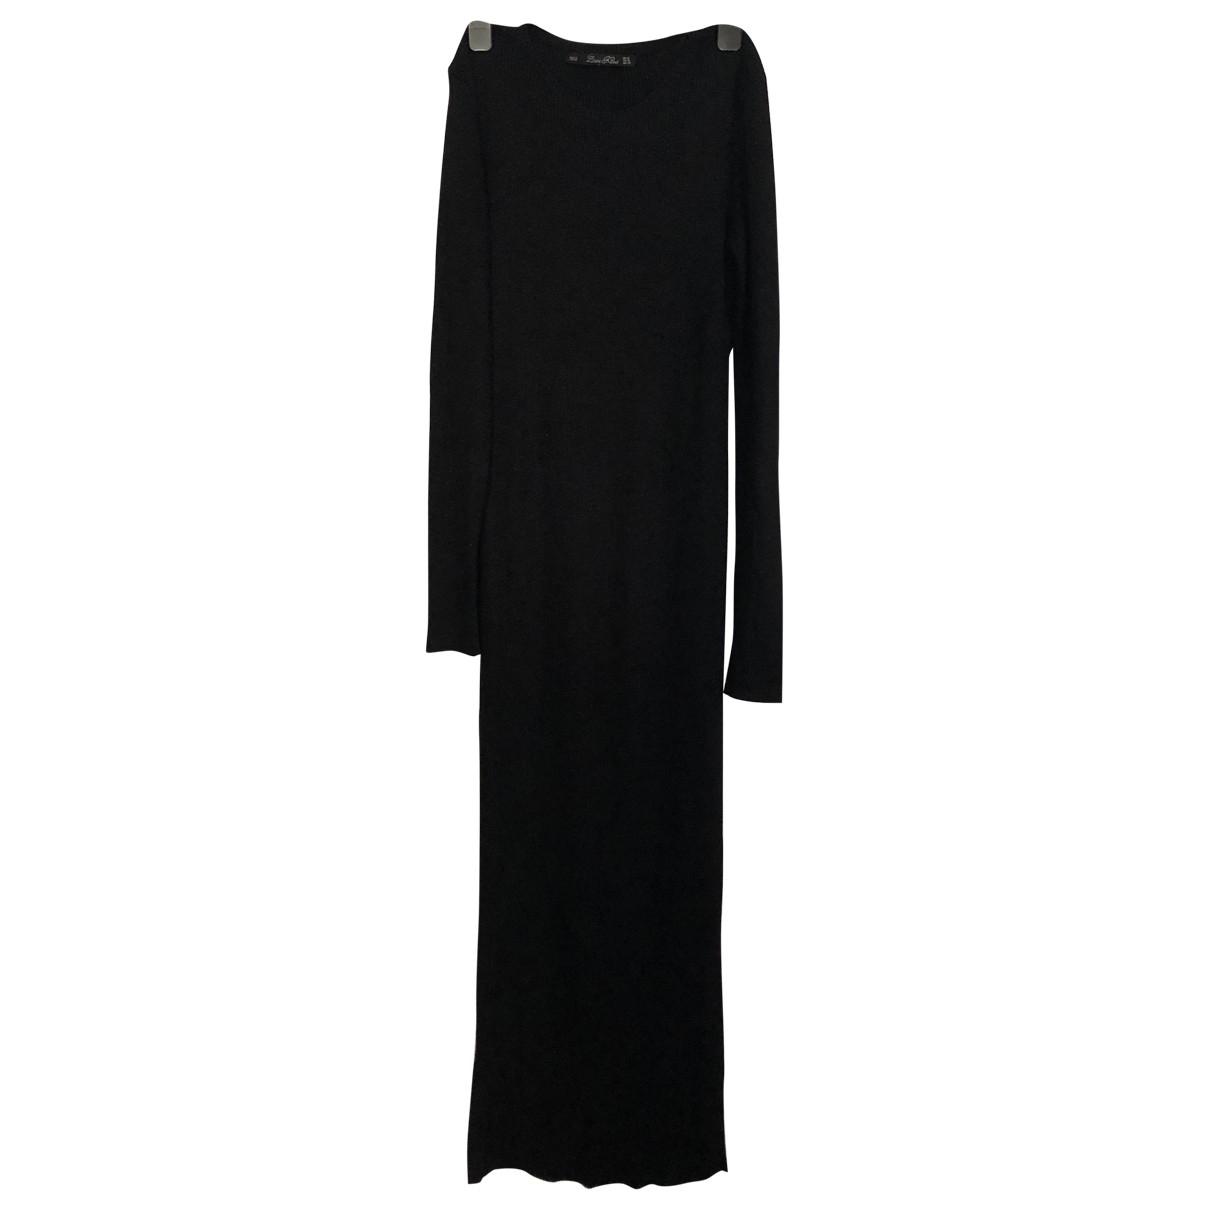 Zara \N Black Cotton - elasthane dress for Women M International